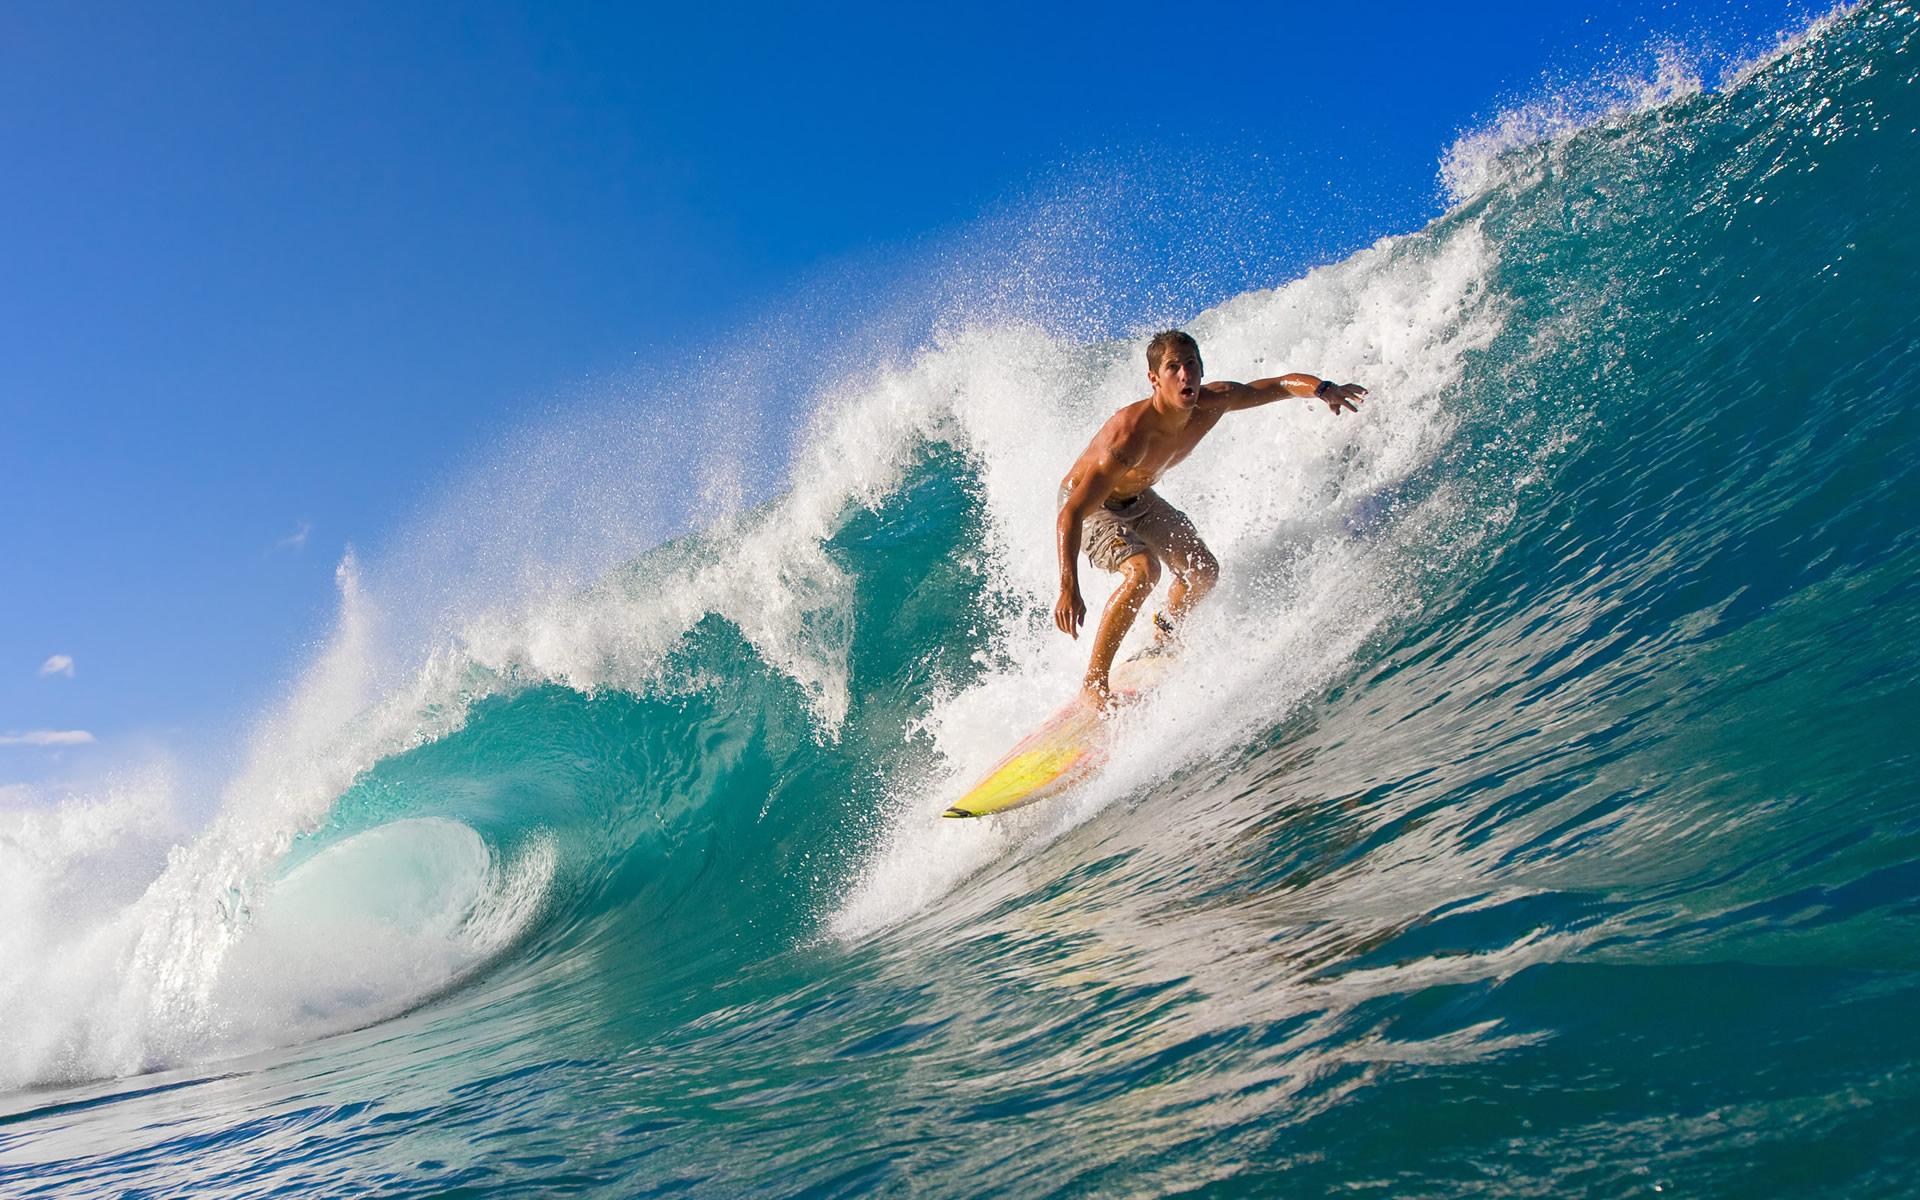 Surfing Summer Wallpaper HD wallpapers   Surfing Summer Wallpaper 1920x1200